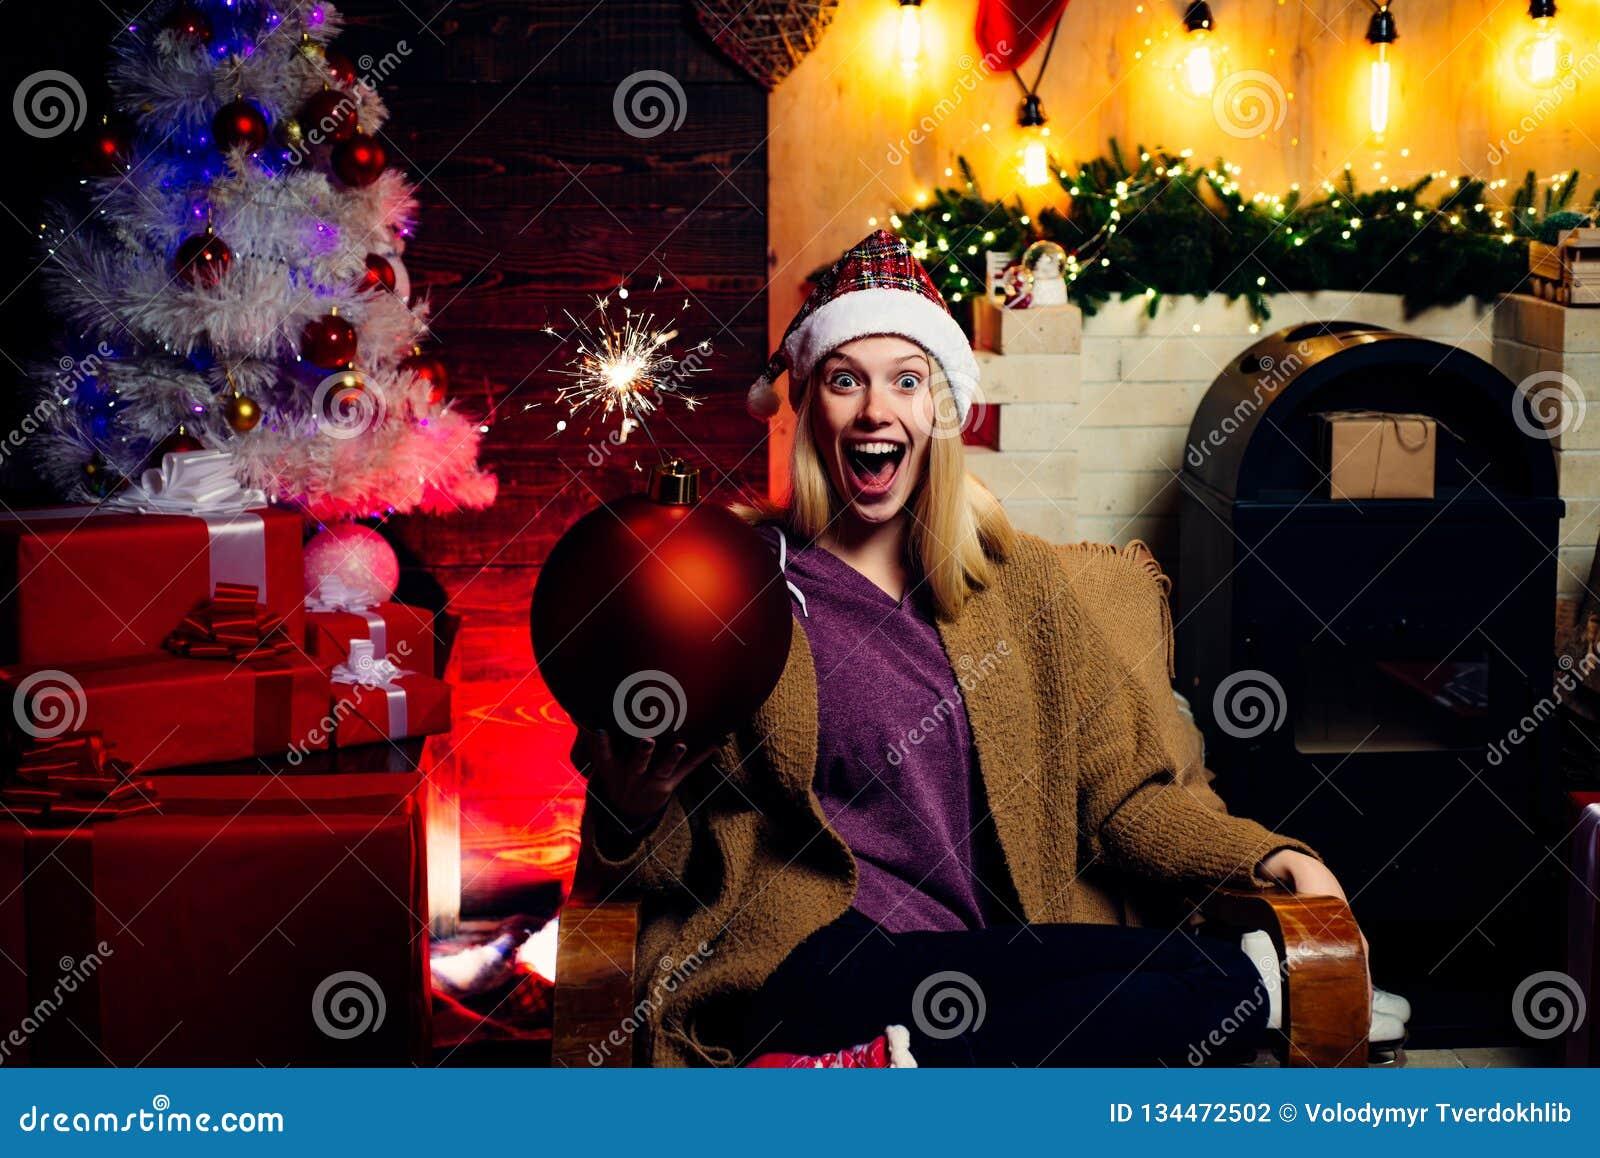 6cf15d20969a Holly jolly swag Christmas and noel. Santa woman in elegant dress. Friendly  and joy